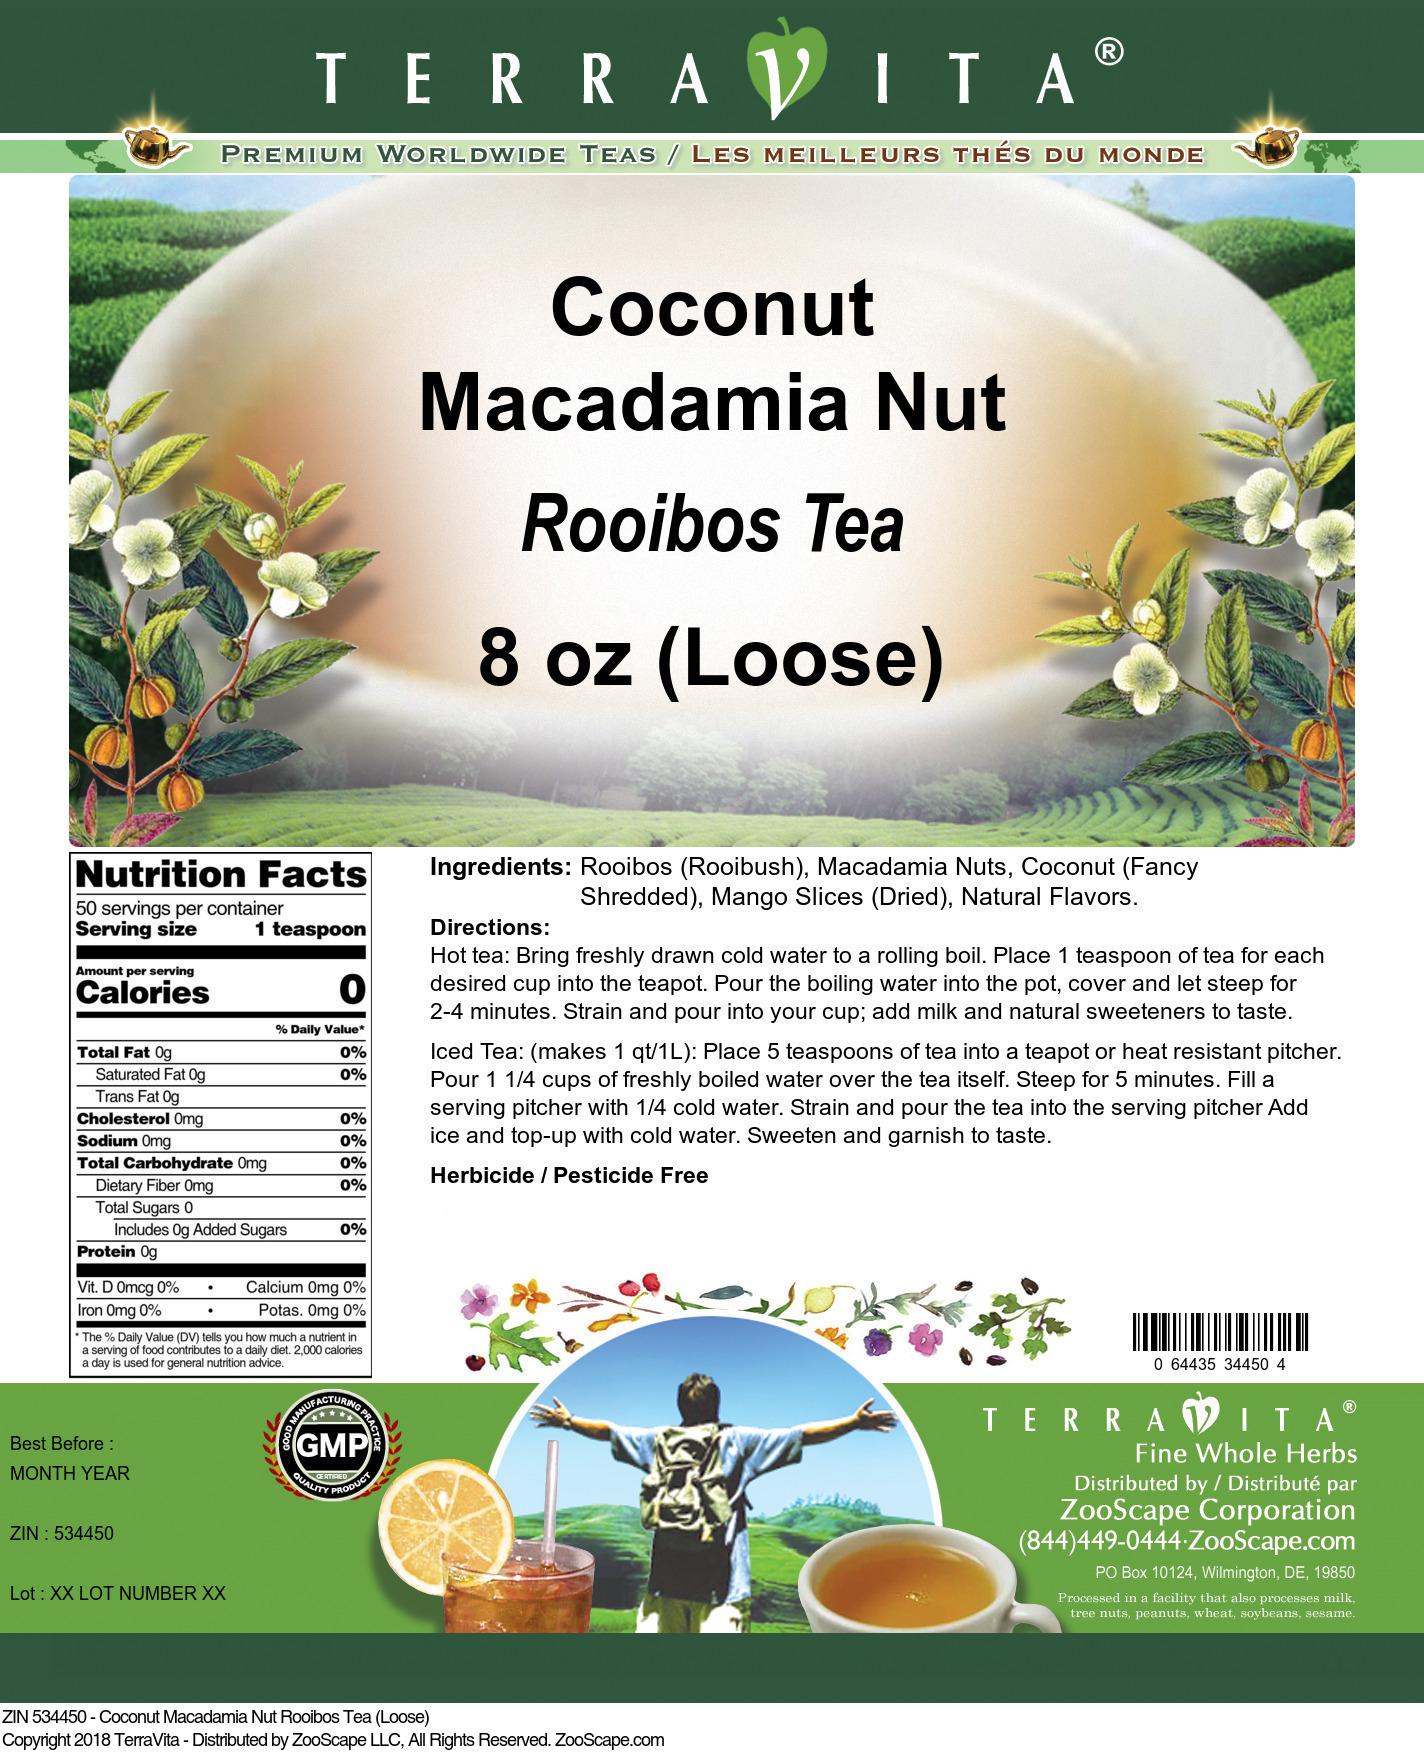 Coconut Macadamia Nut Rooibos Tea